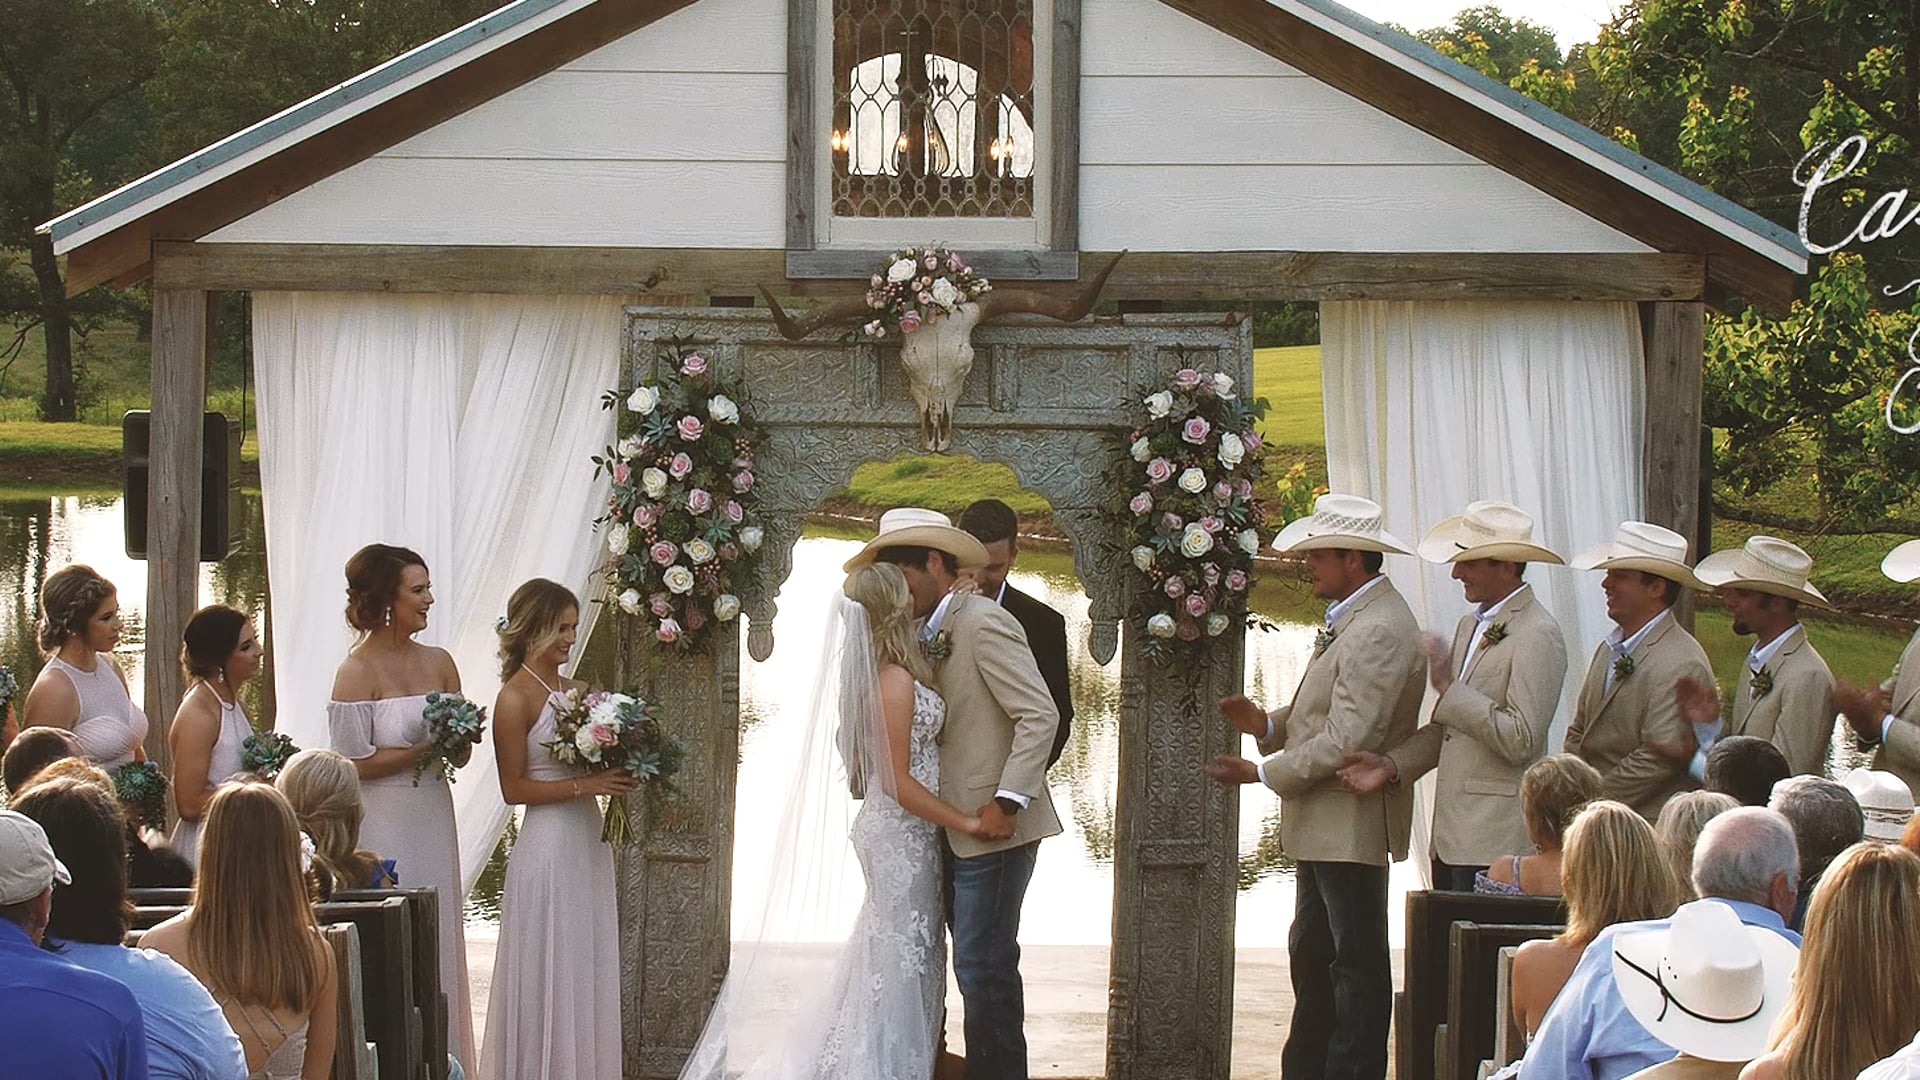 Cassidy & Ric / The White Magnolia / A Cowboy Wedding